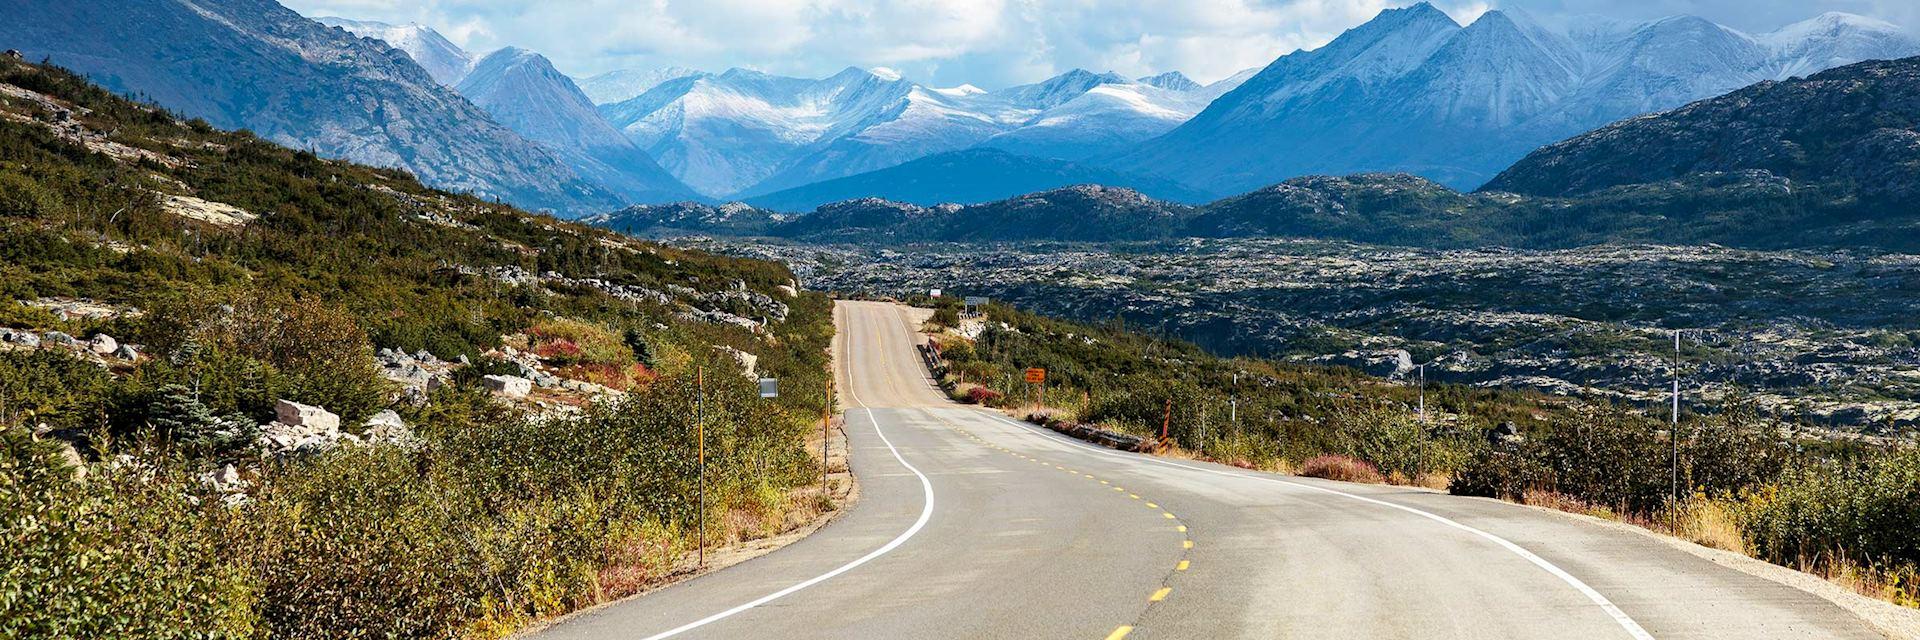 Klondike Highway in the Yukon